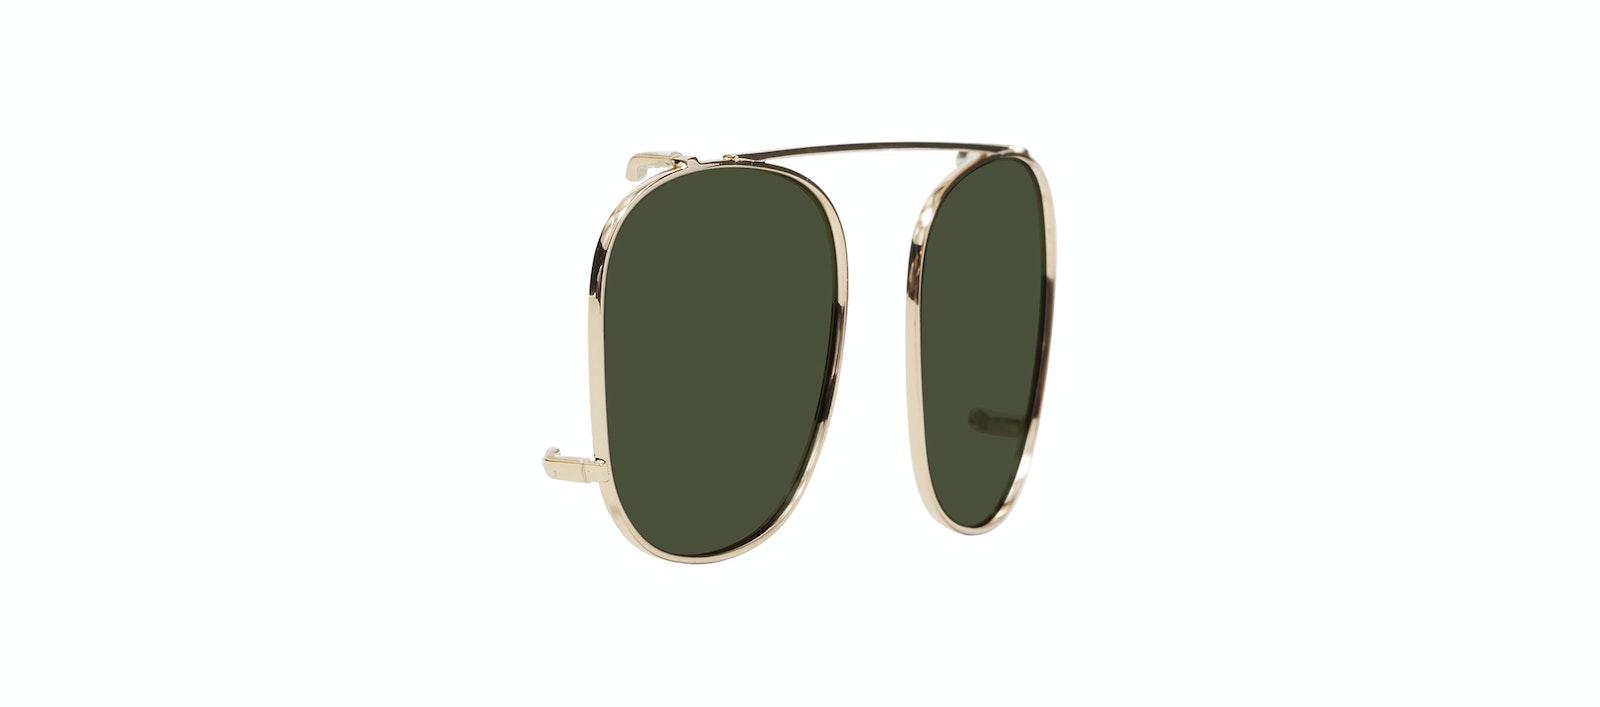 Affordable Fashion Glasses Accessory Men Apex Clip S Gold Tilt